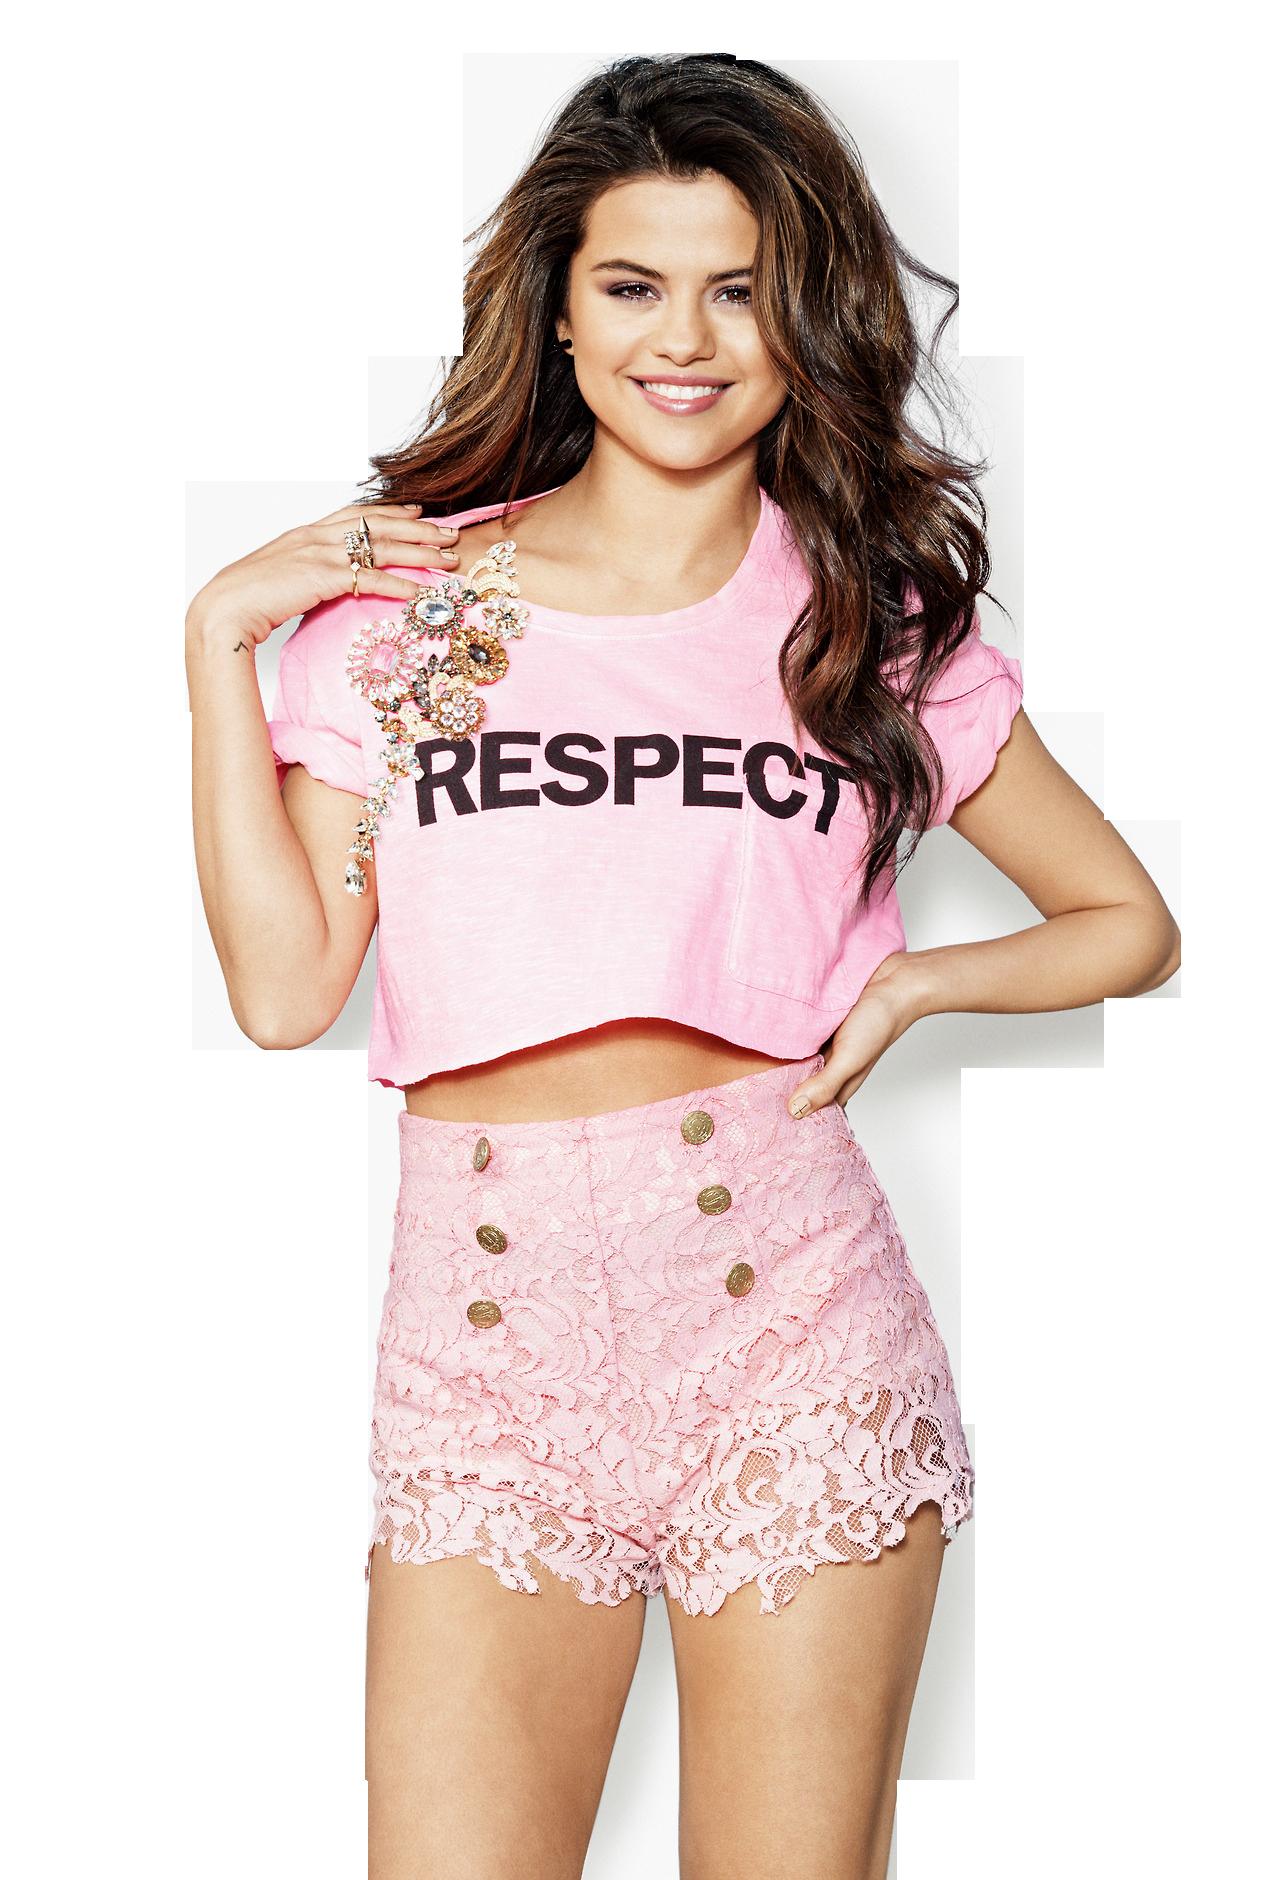 Selena Gomez Png 3 By Lizziepony12 Selena Gomez Png 3 By Lizziepony12 - Selena Gomez, Transparent background PNG HD thumbnail